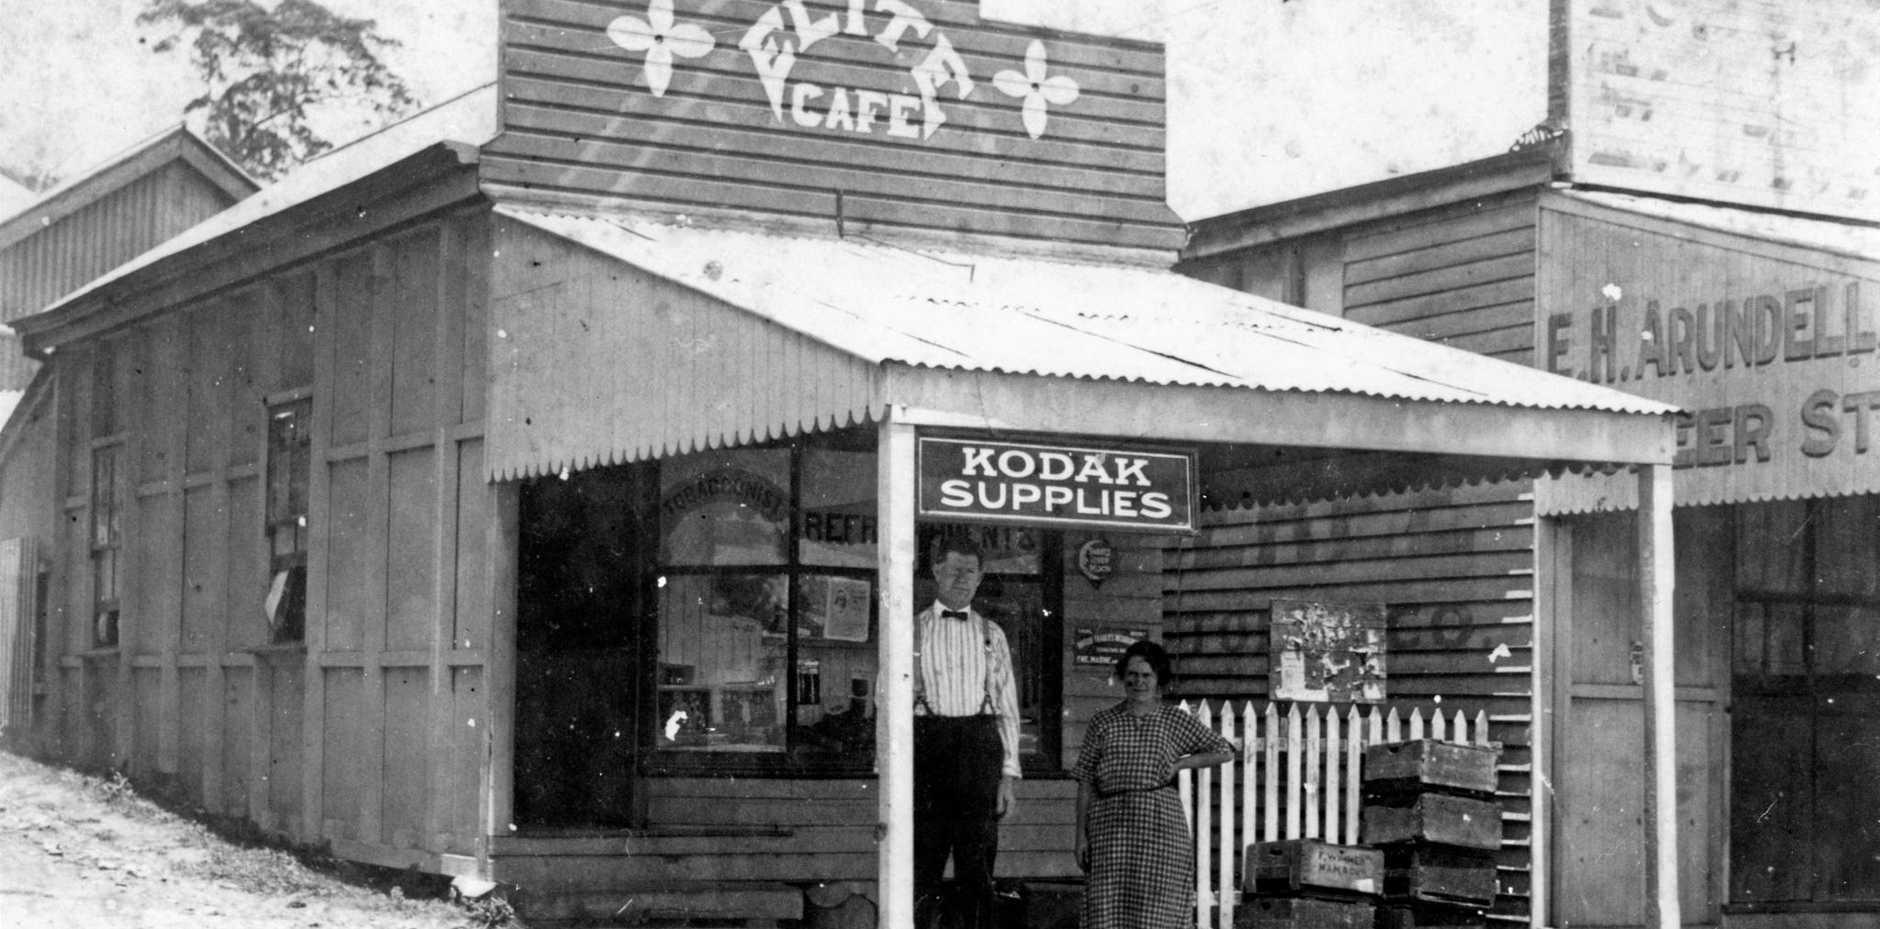 R. Denney's Elite Cafe in Memorial Dr, Eumundi, ca 1922.